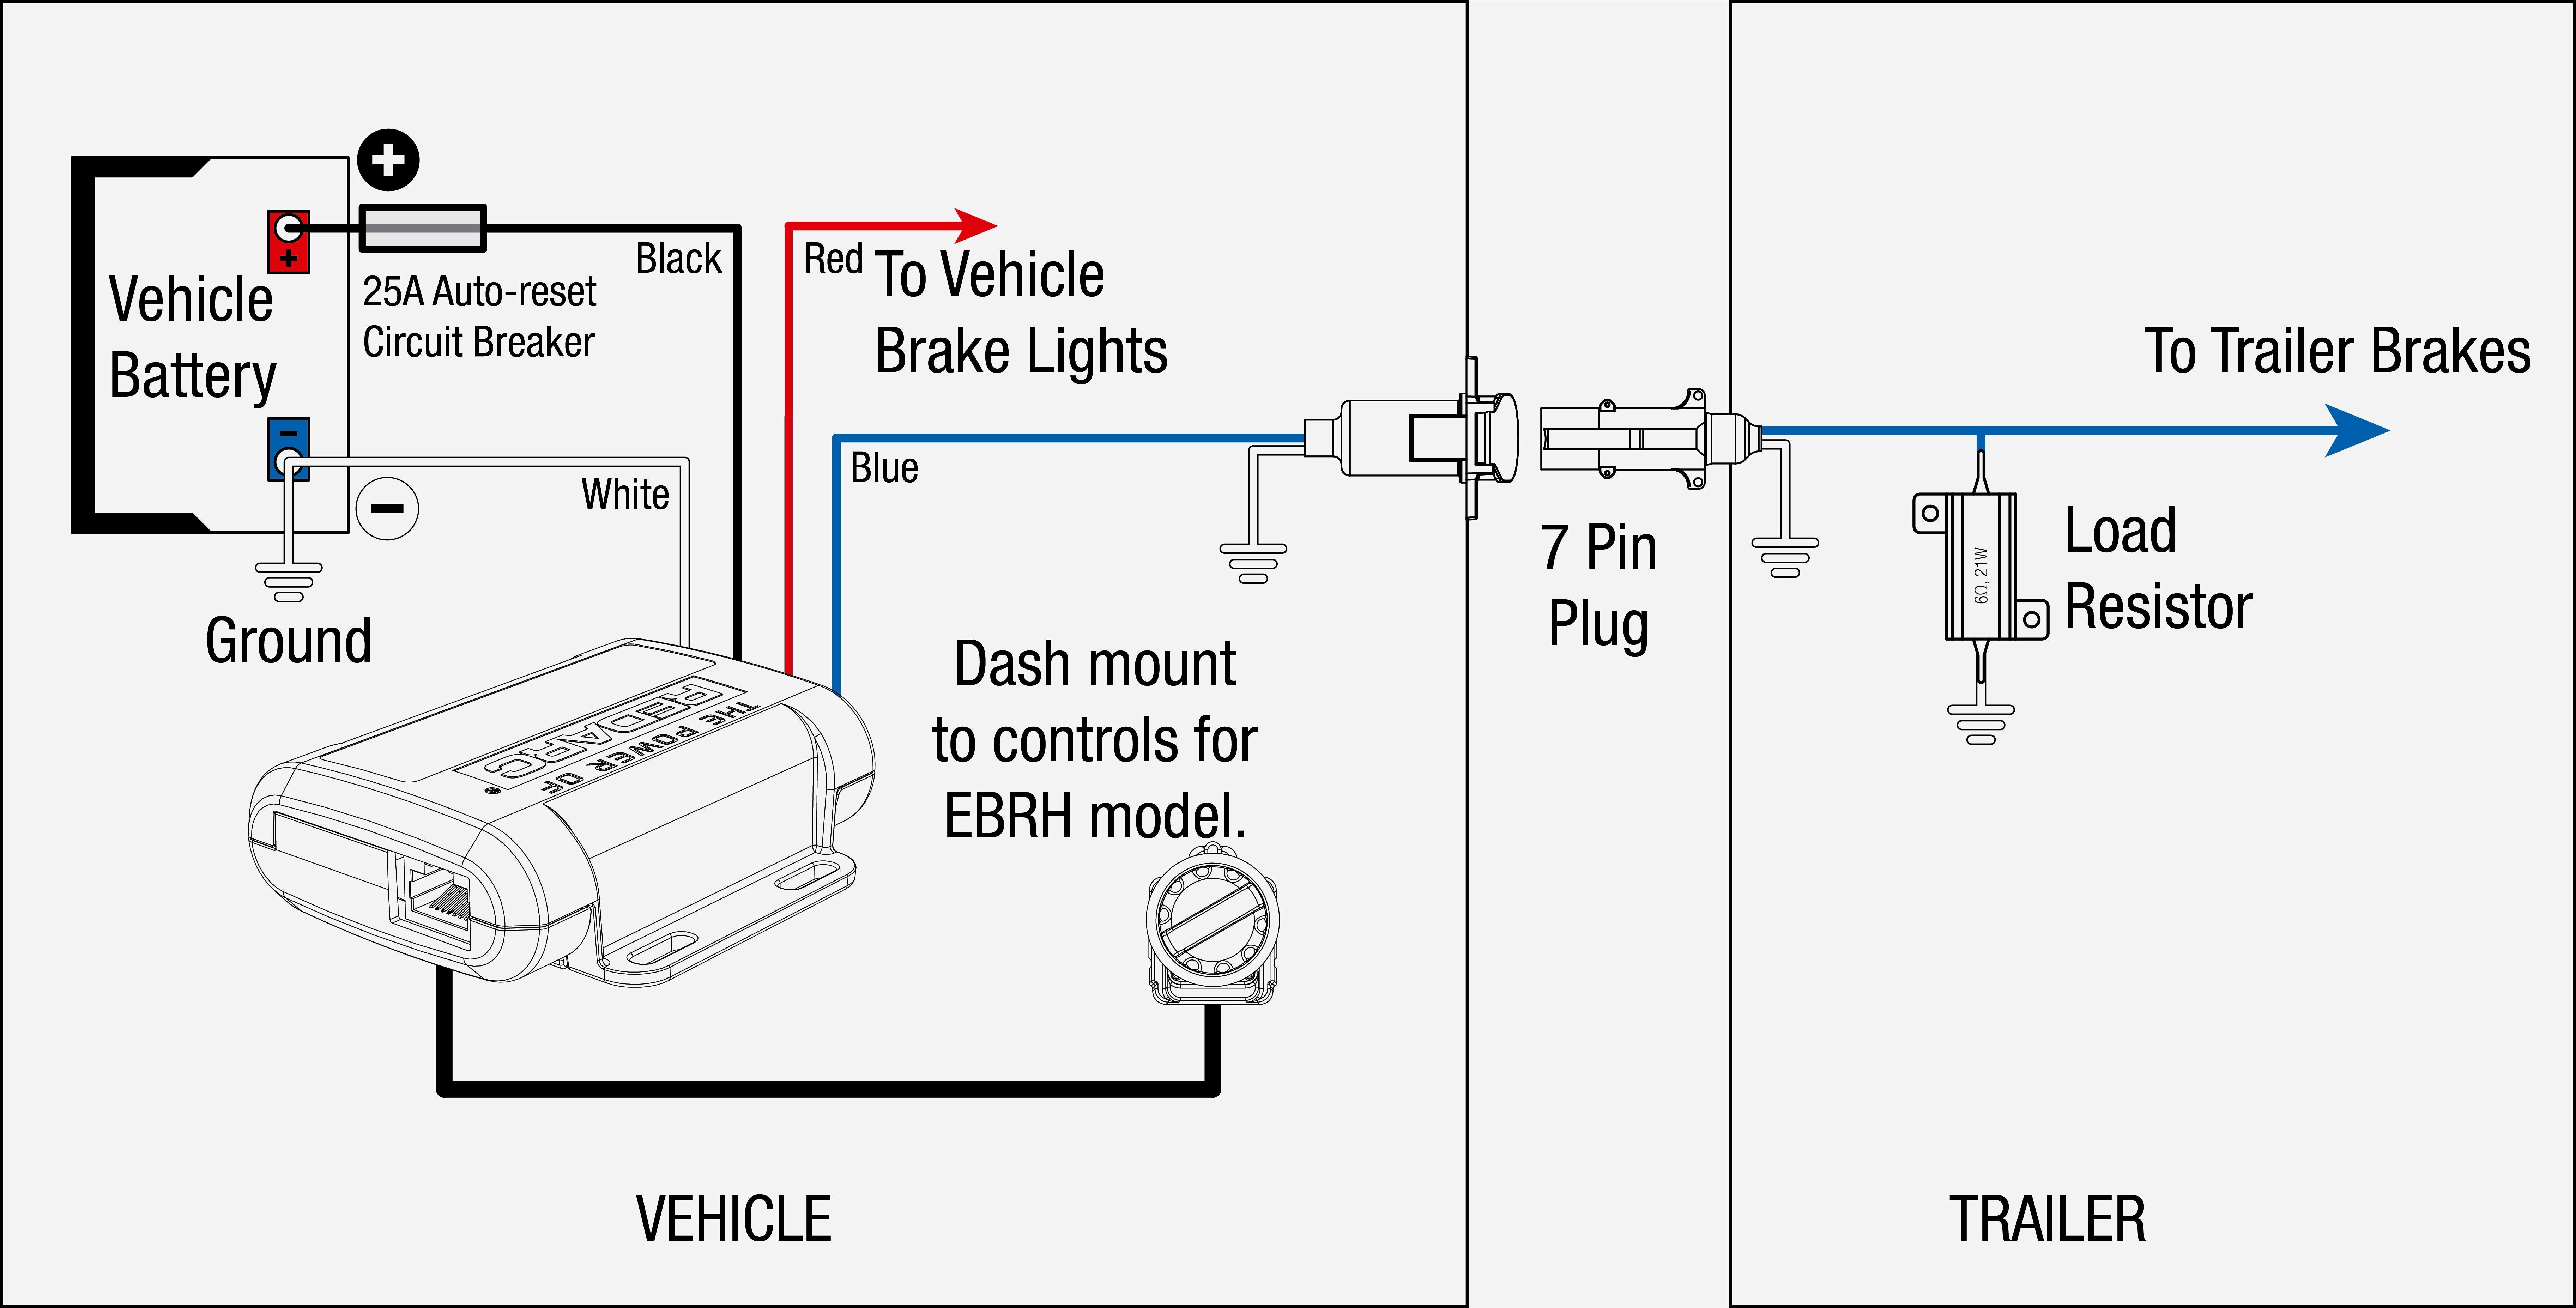 2009 Silverado Trailer Wiring Diagram Schematic Diagrams Brake Residential Electrical Chevy Plug